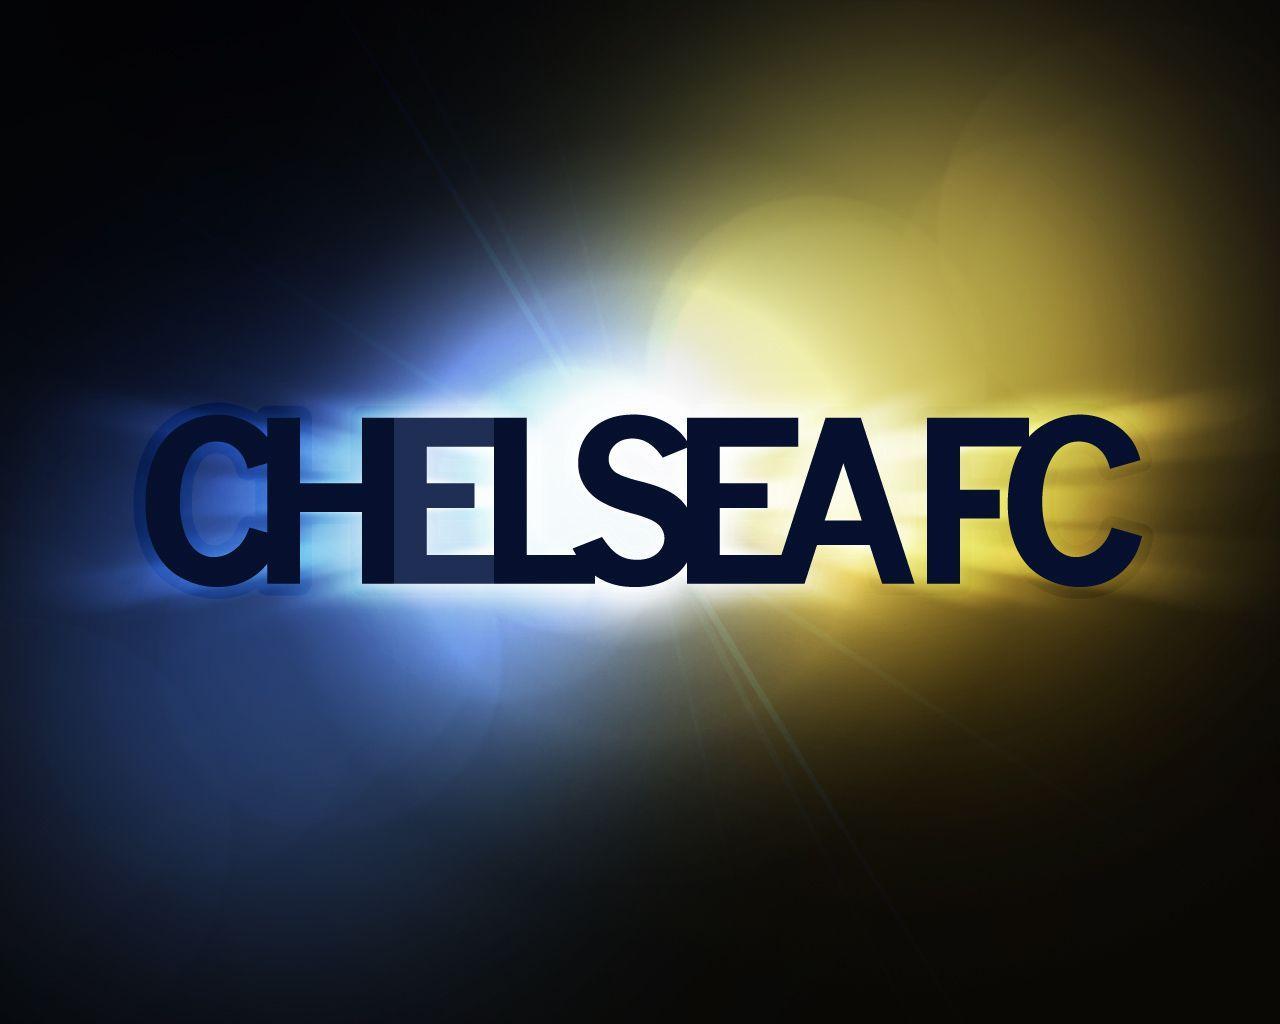 Chelsea Football Club Font | Wallpaperspedia